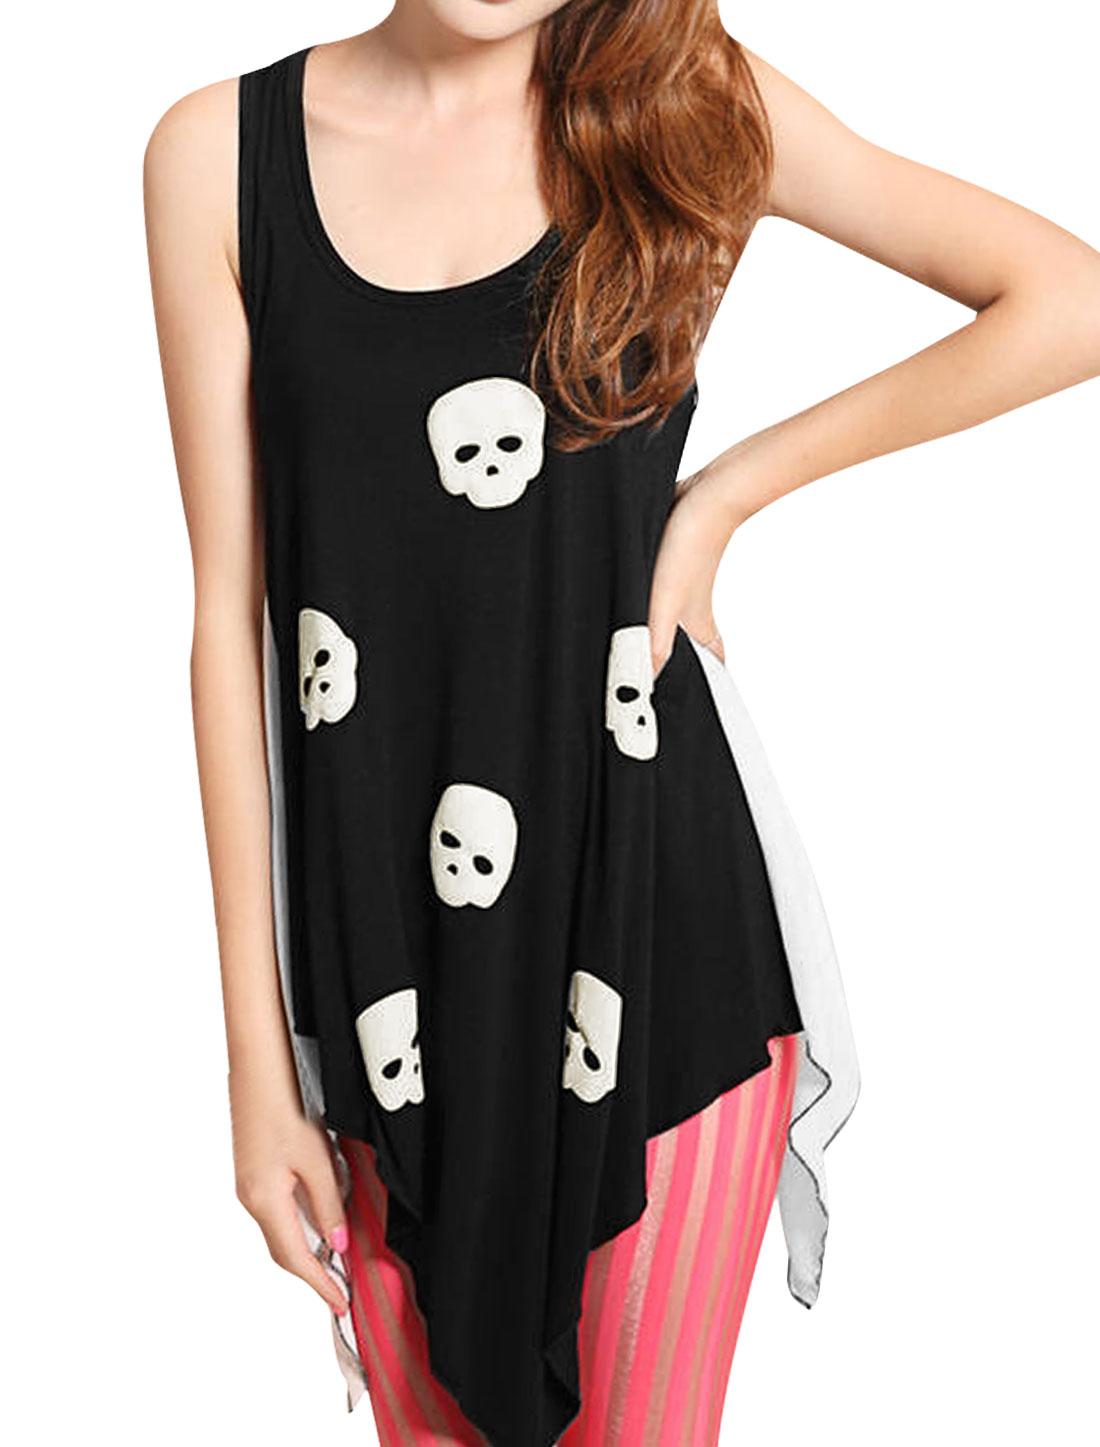 Lady White Irregular Hem Skull Print Pullover Sleeveless Top XS